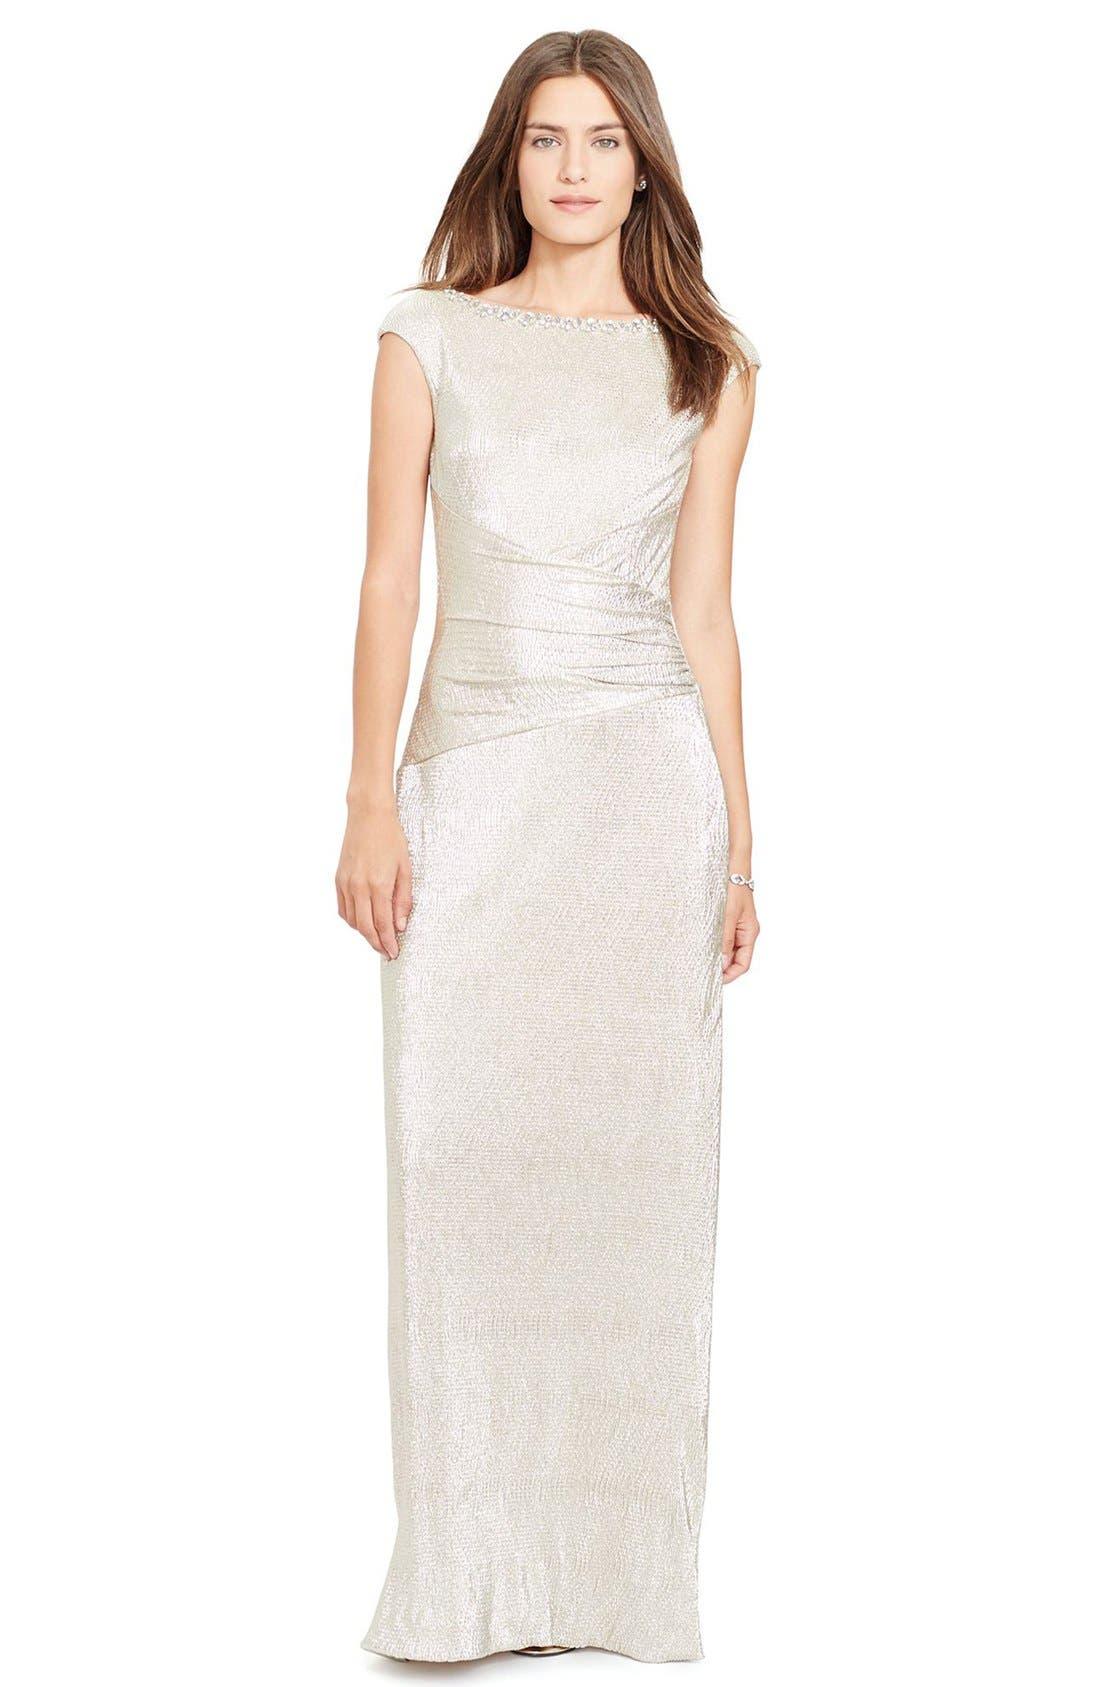 Alternate Image 1 Selected - Lauren Ralph Lauren Embellished Metallic Knit Column Gown (Regular & Petite)